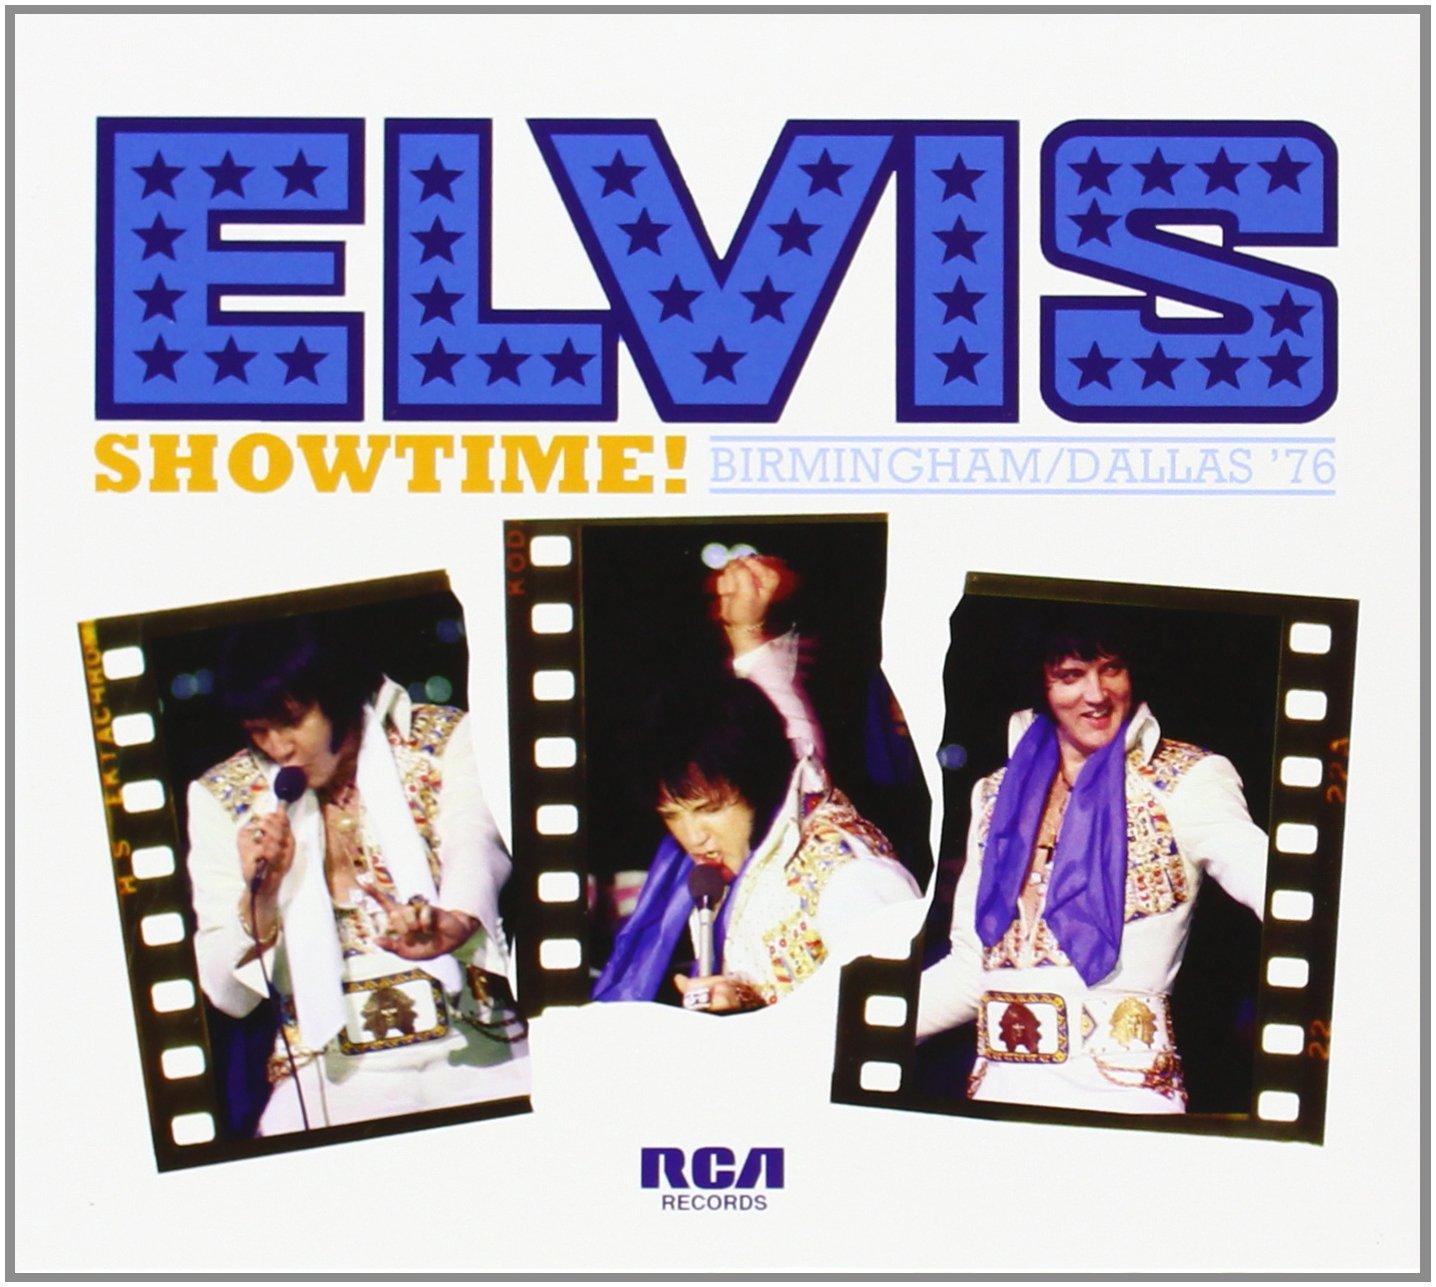 Showtime-Birmingham/Dall